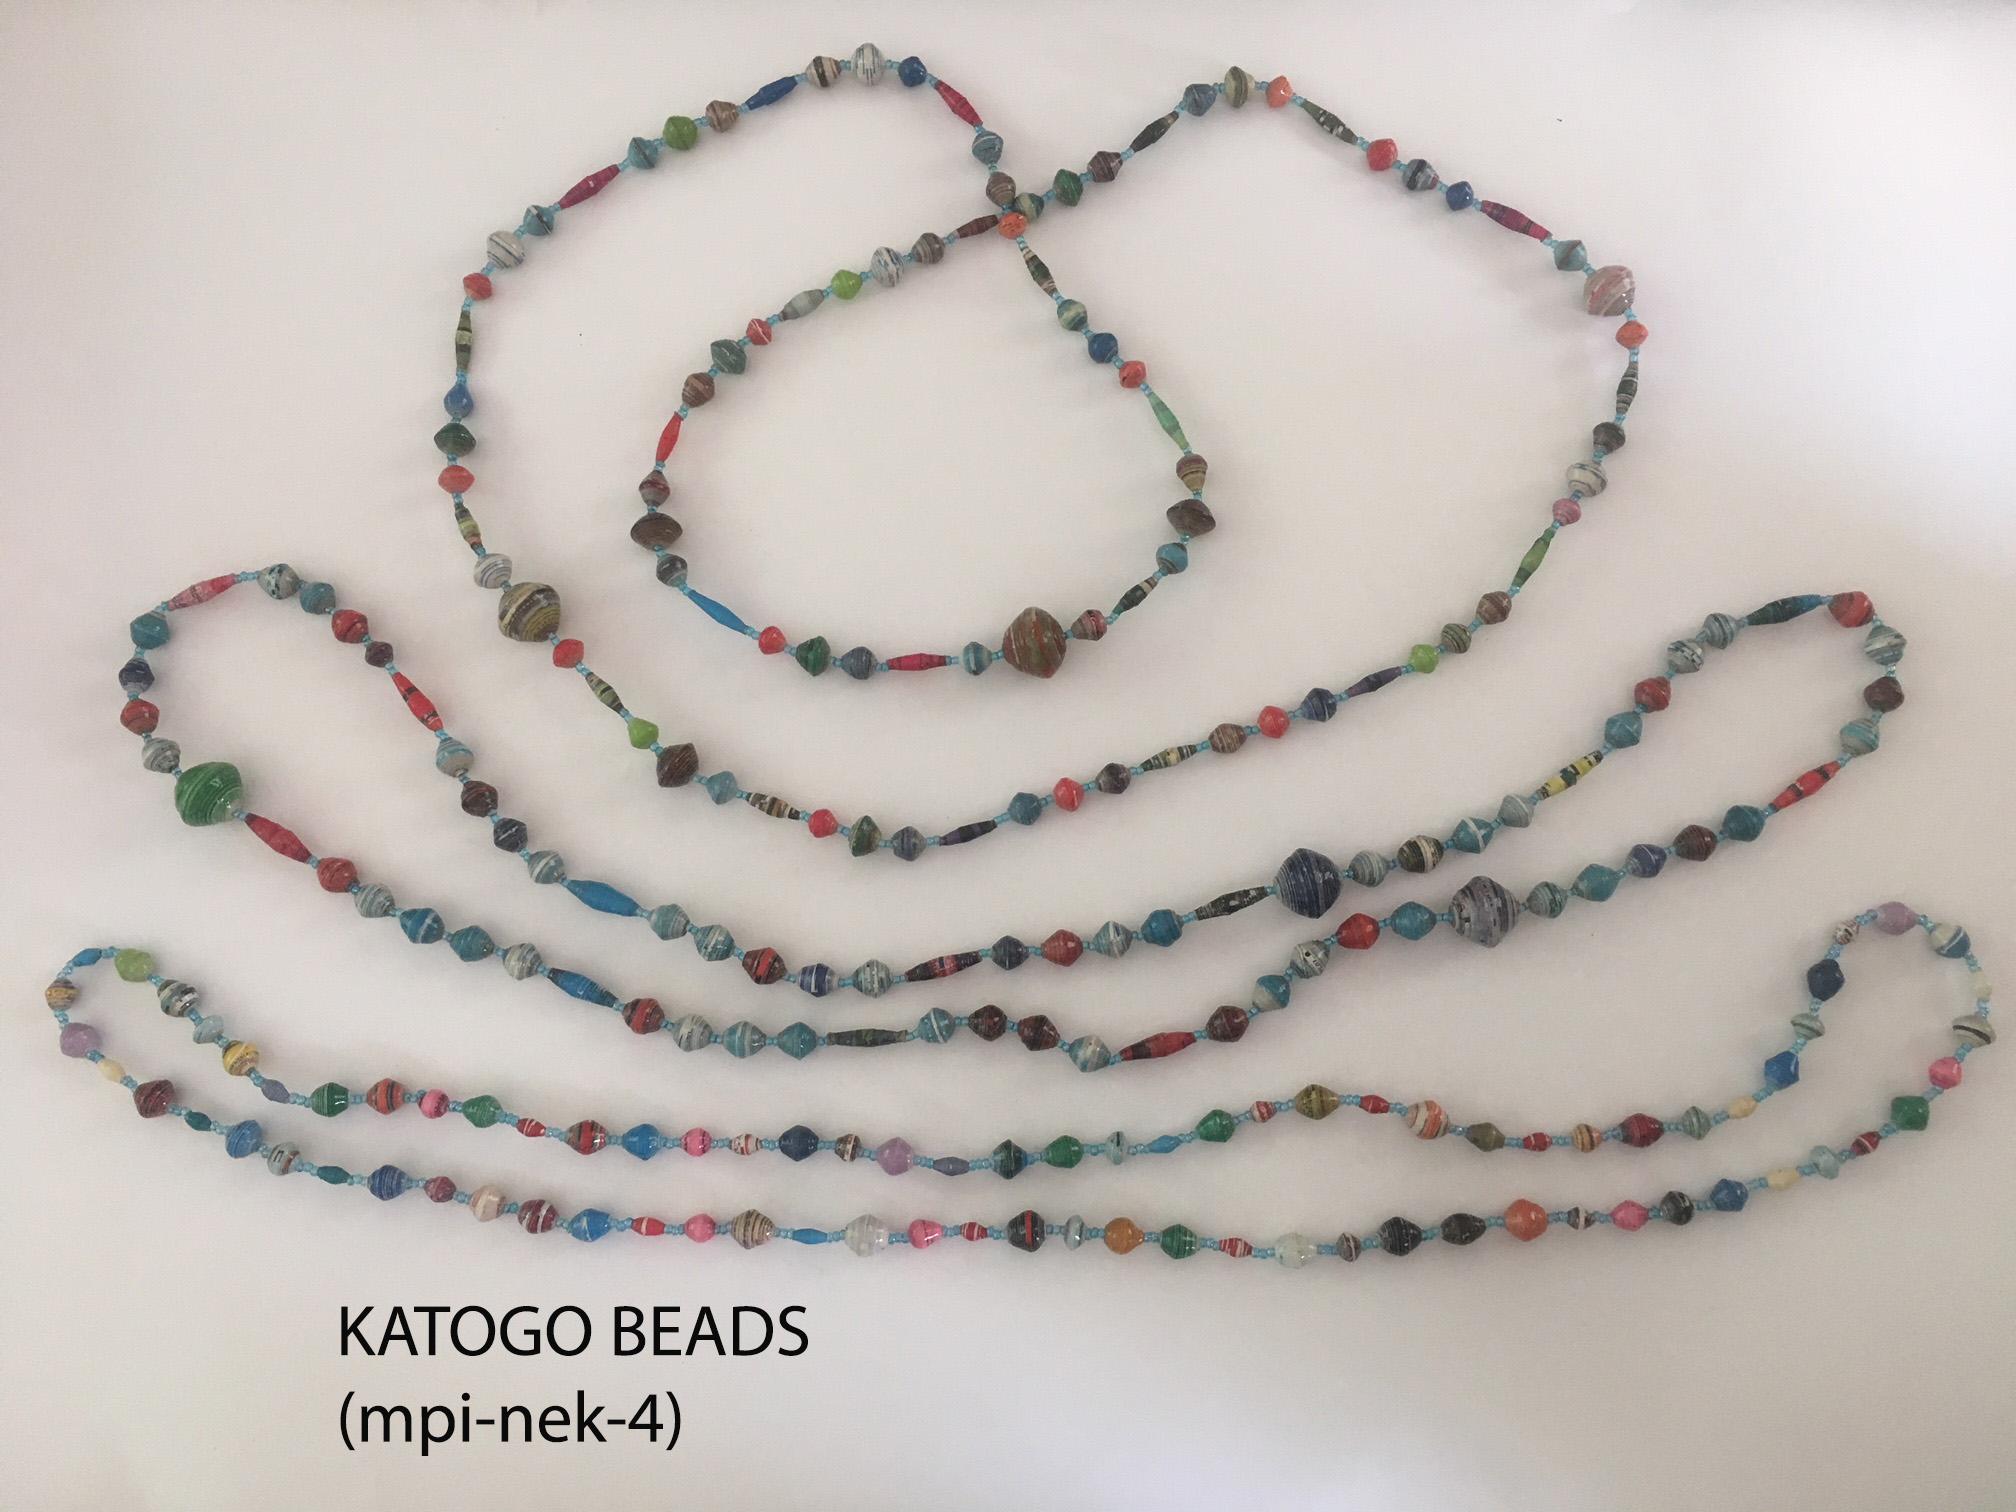 Katogo Beads (mpi-nek-4)